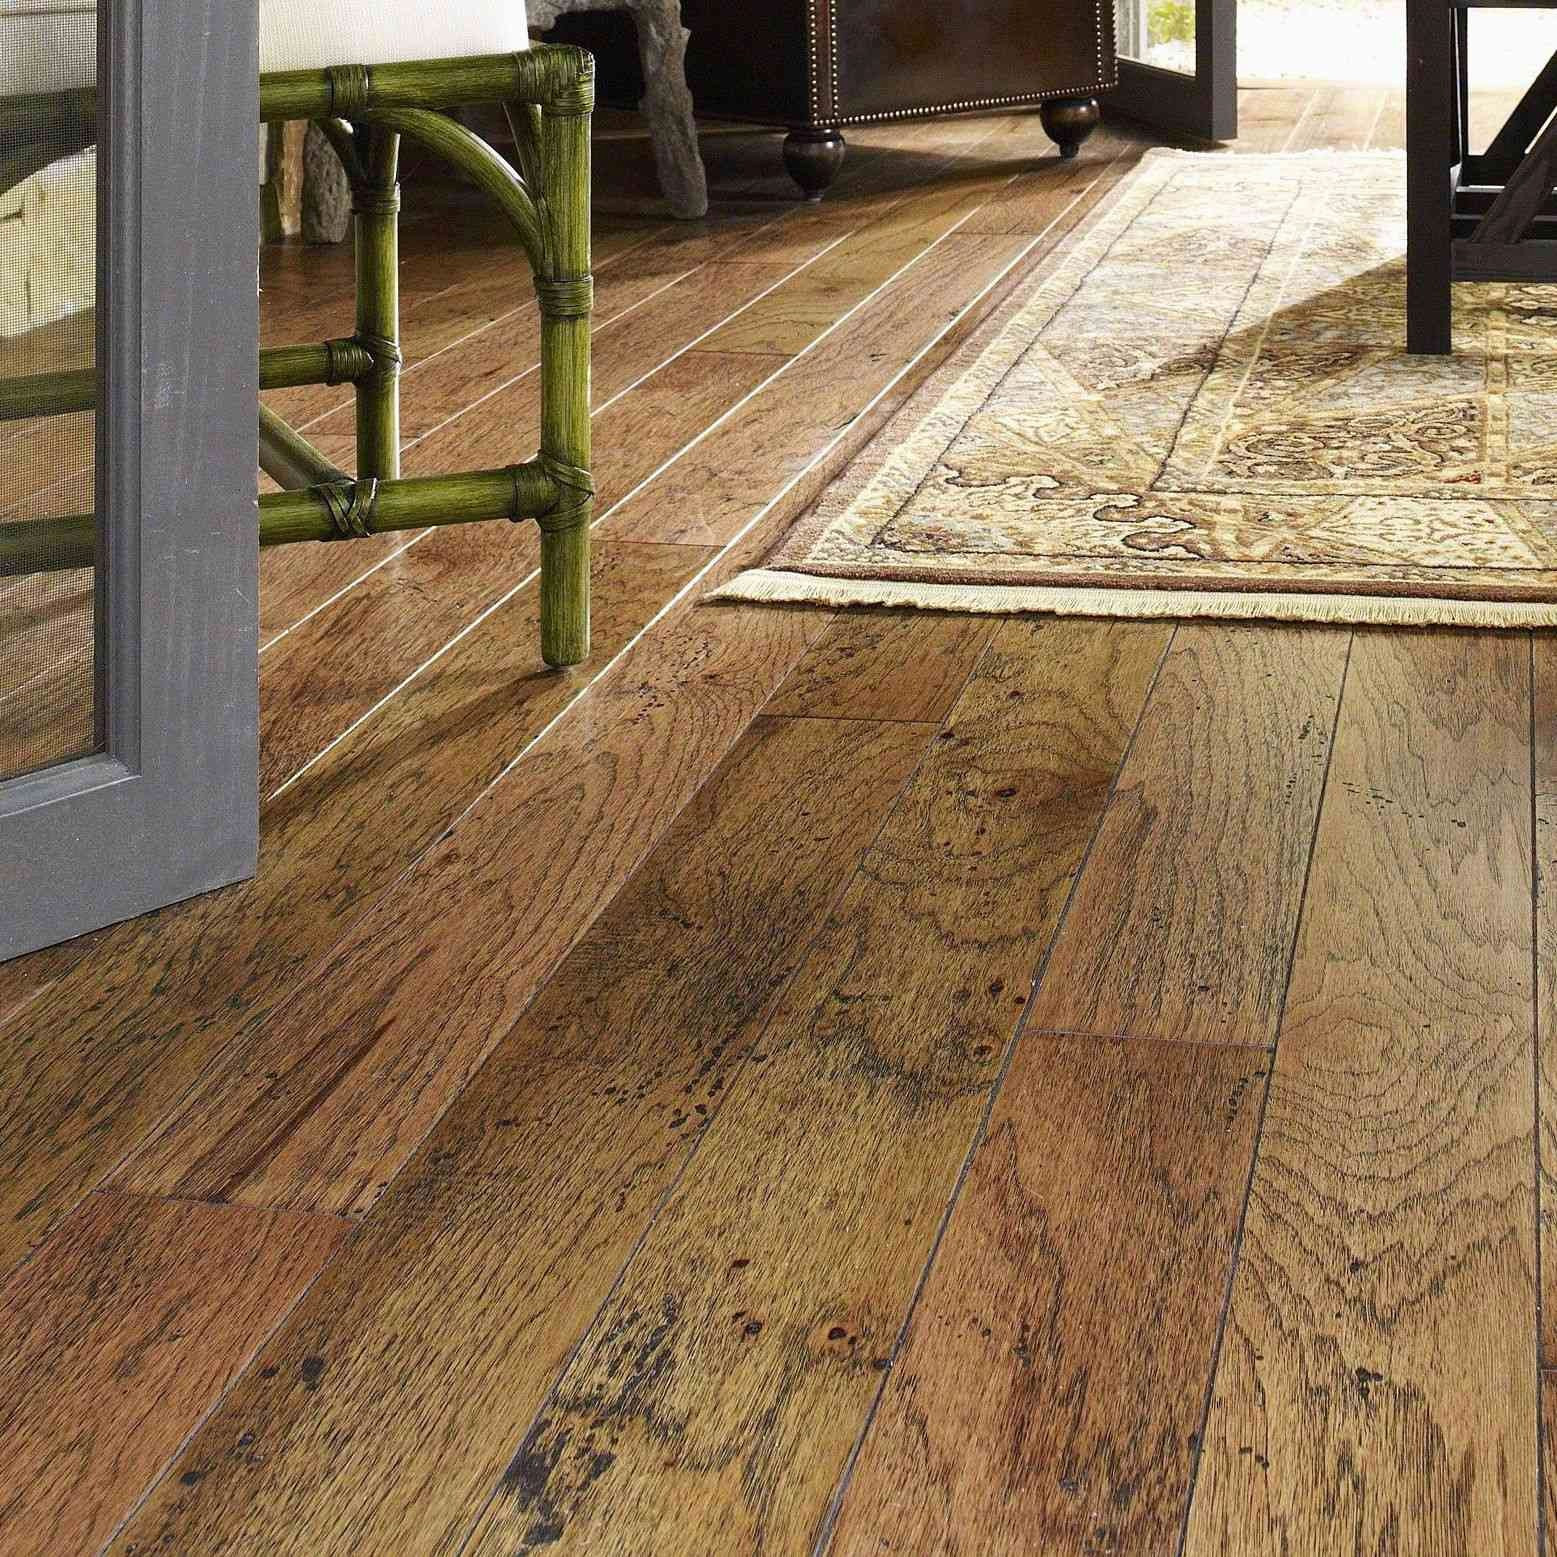 walnut hardwood flooring durability of 15 elegant how much is hardwood flooring pics dizpos com with how much is hardwood flooring best of picture 27 of 50 hardwood floor designs new best